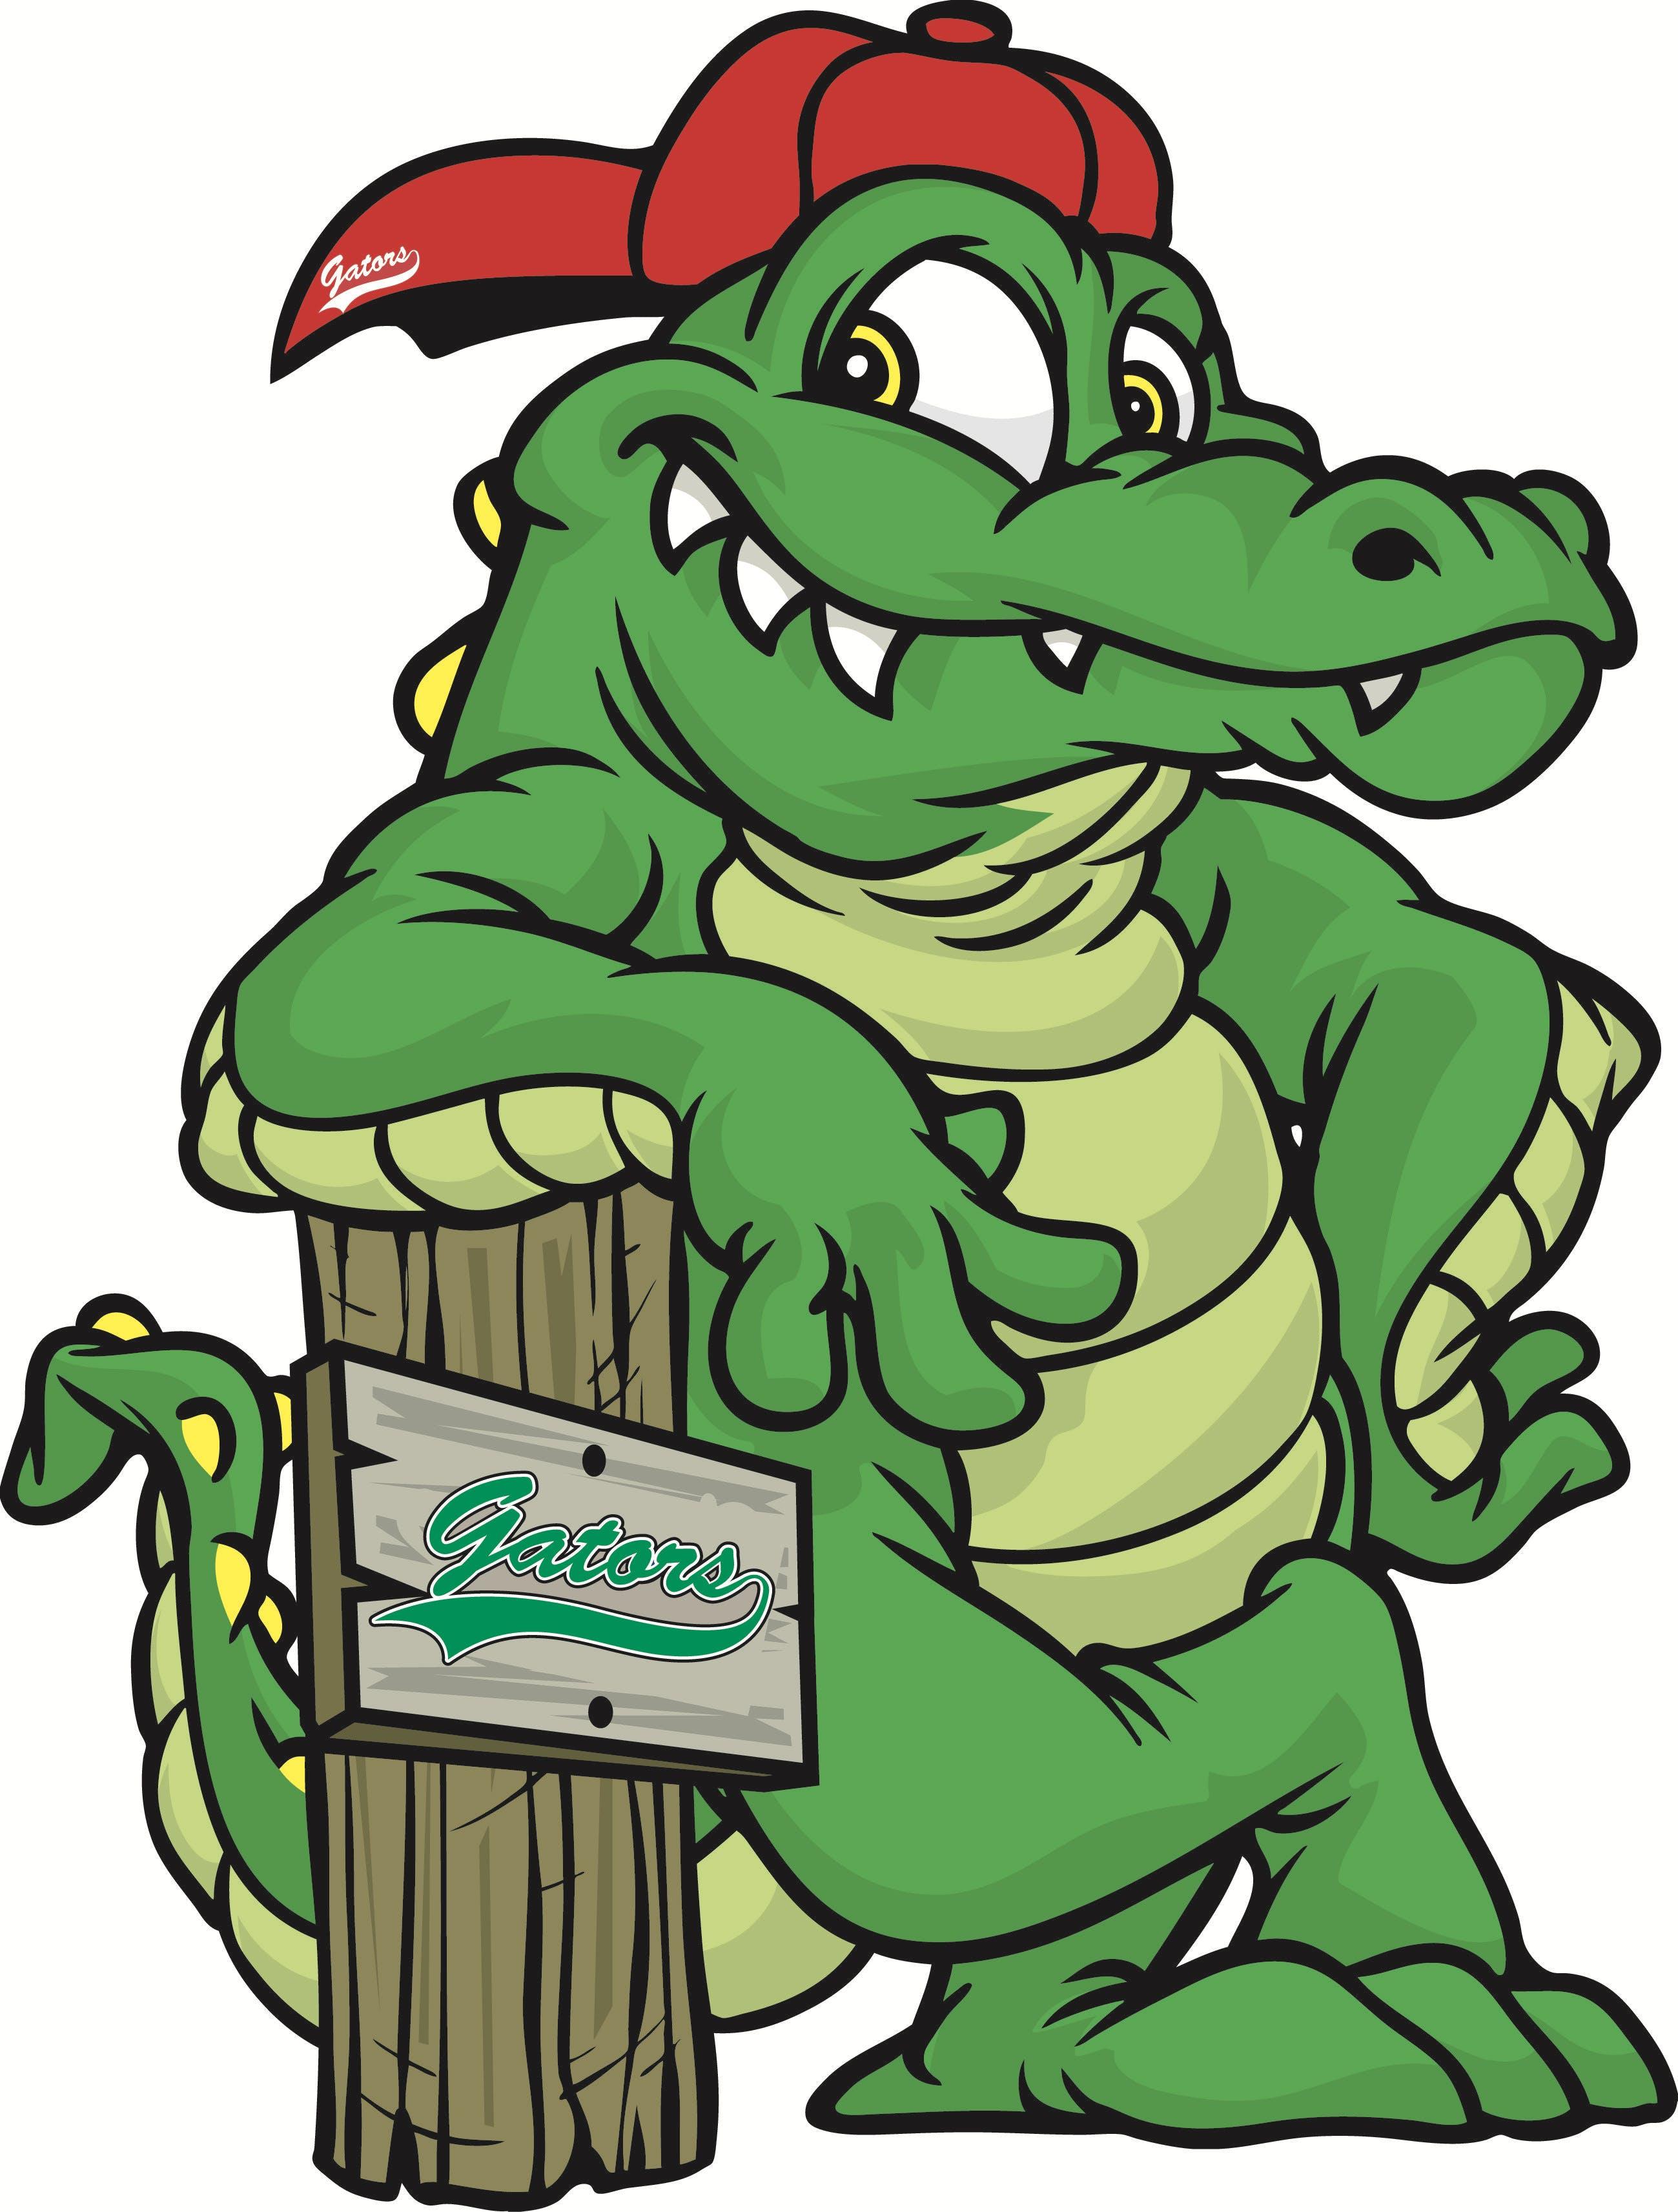 Gator's Thursday Night